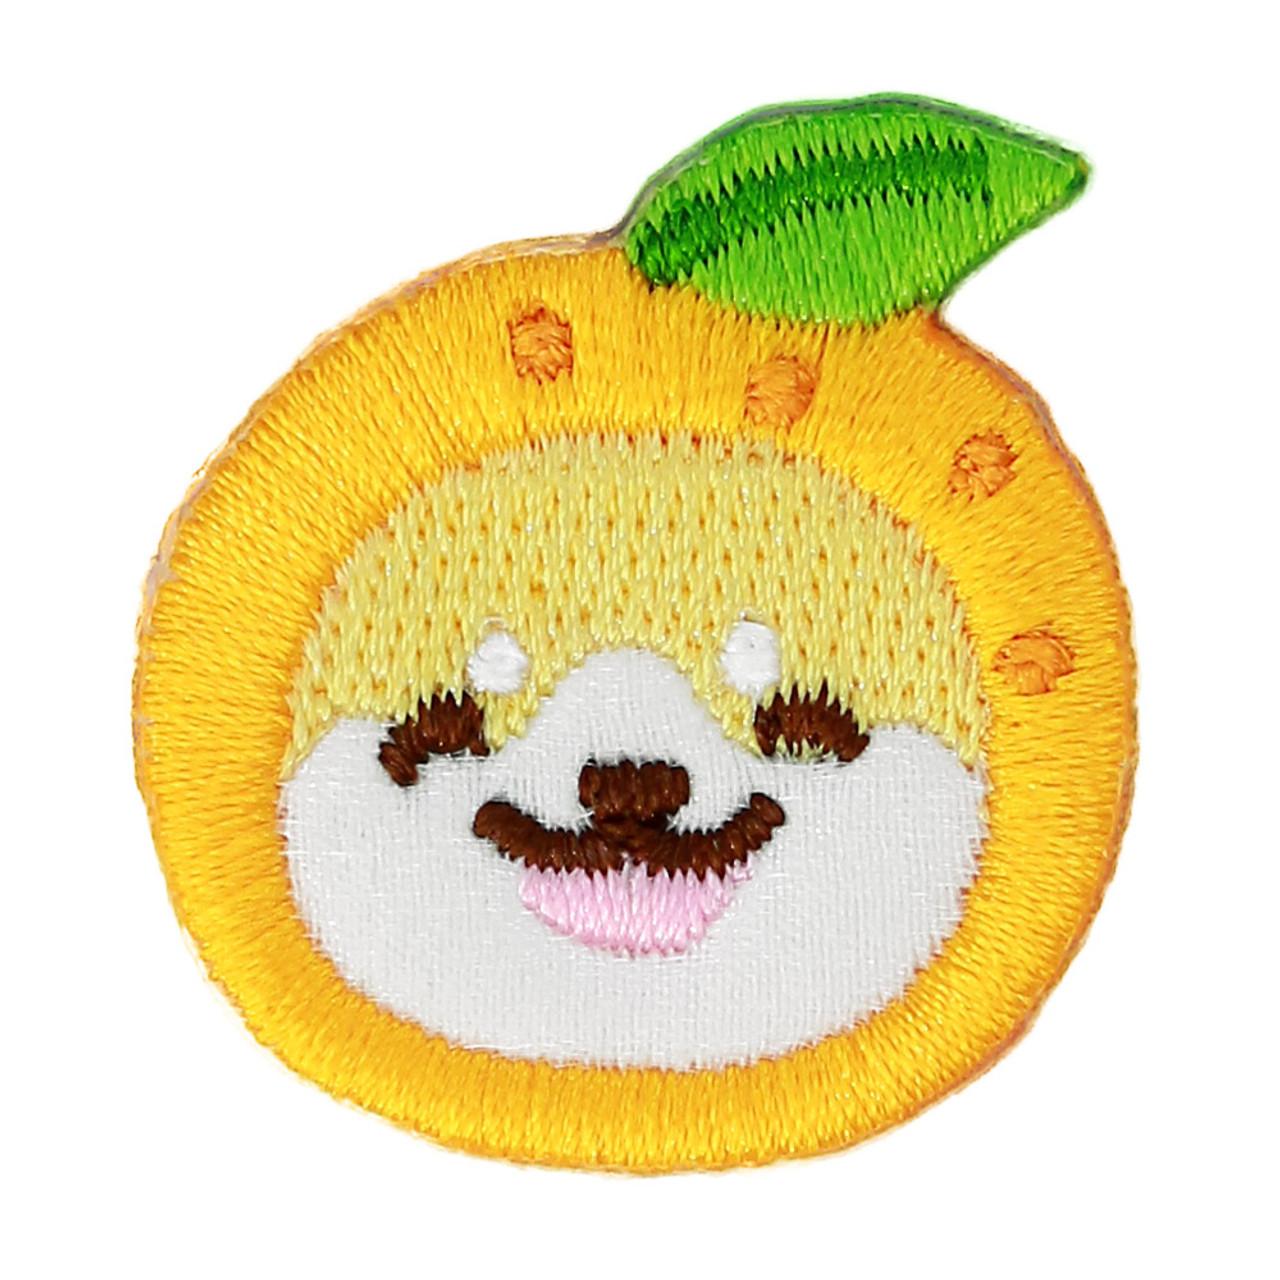 Kawaii Dog Shiba Inu Fruit Cosplay Iron On Patch ( Front View )